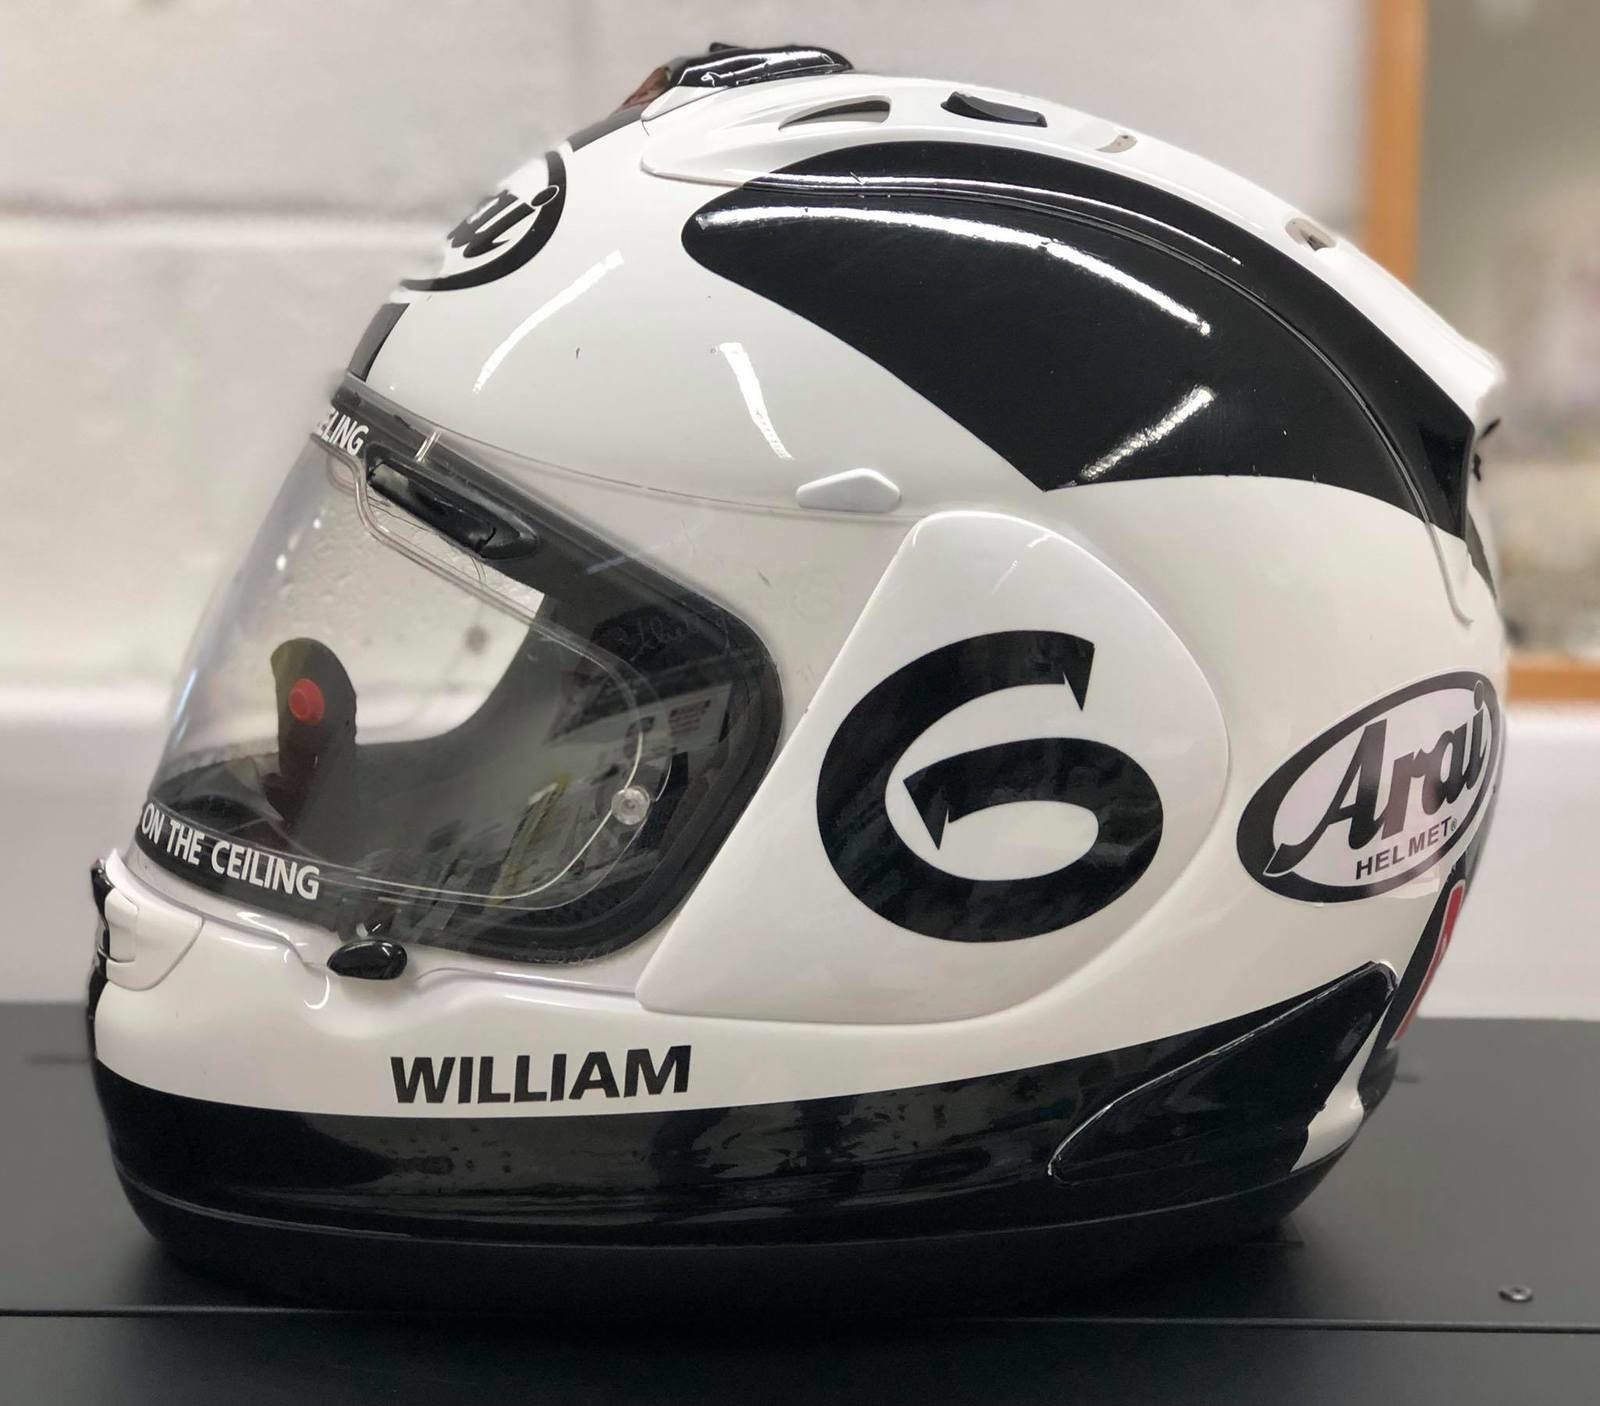 Sam Dunlop rend hommage à William Dunlop.